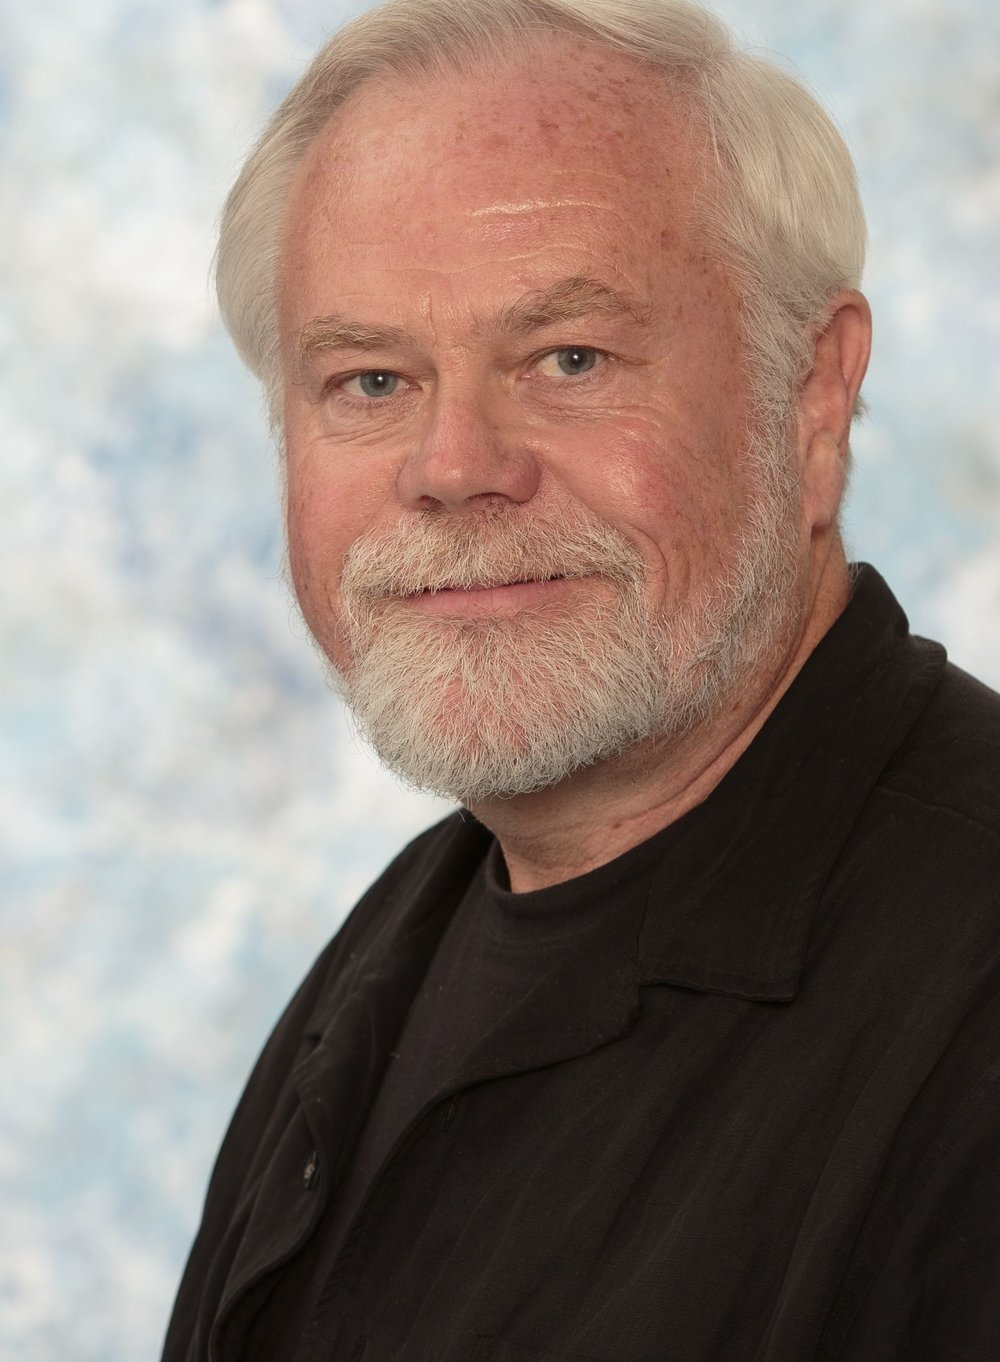 Scott Holland